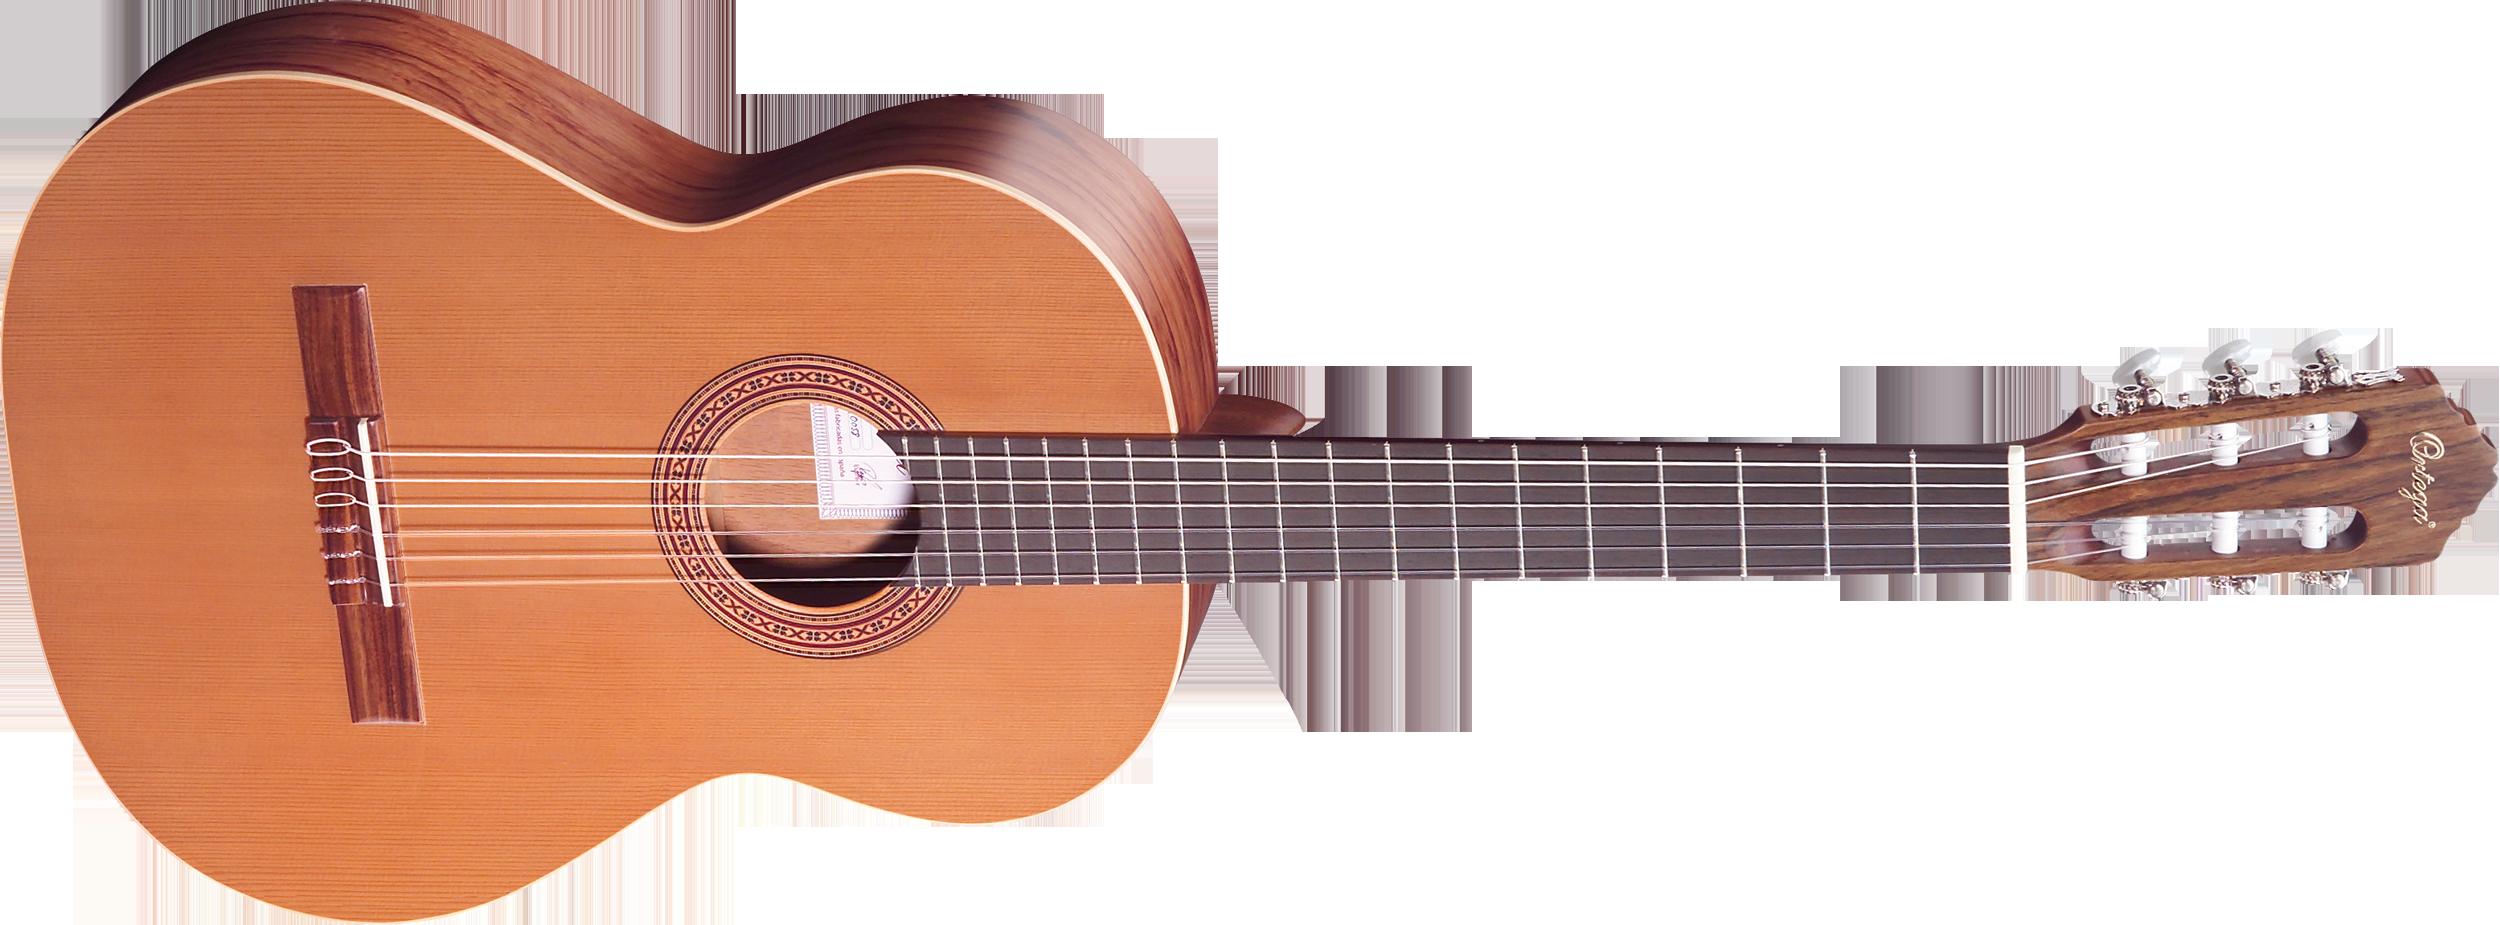 Acoustic HD PNG - 89252